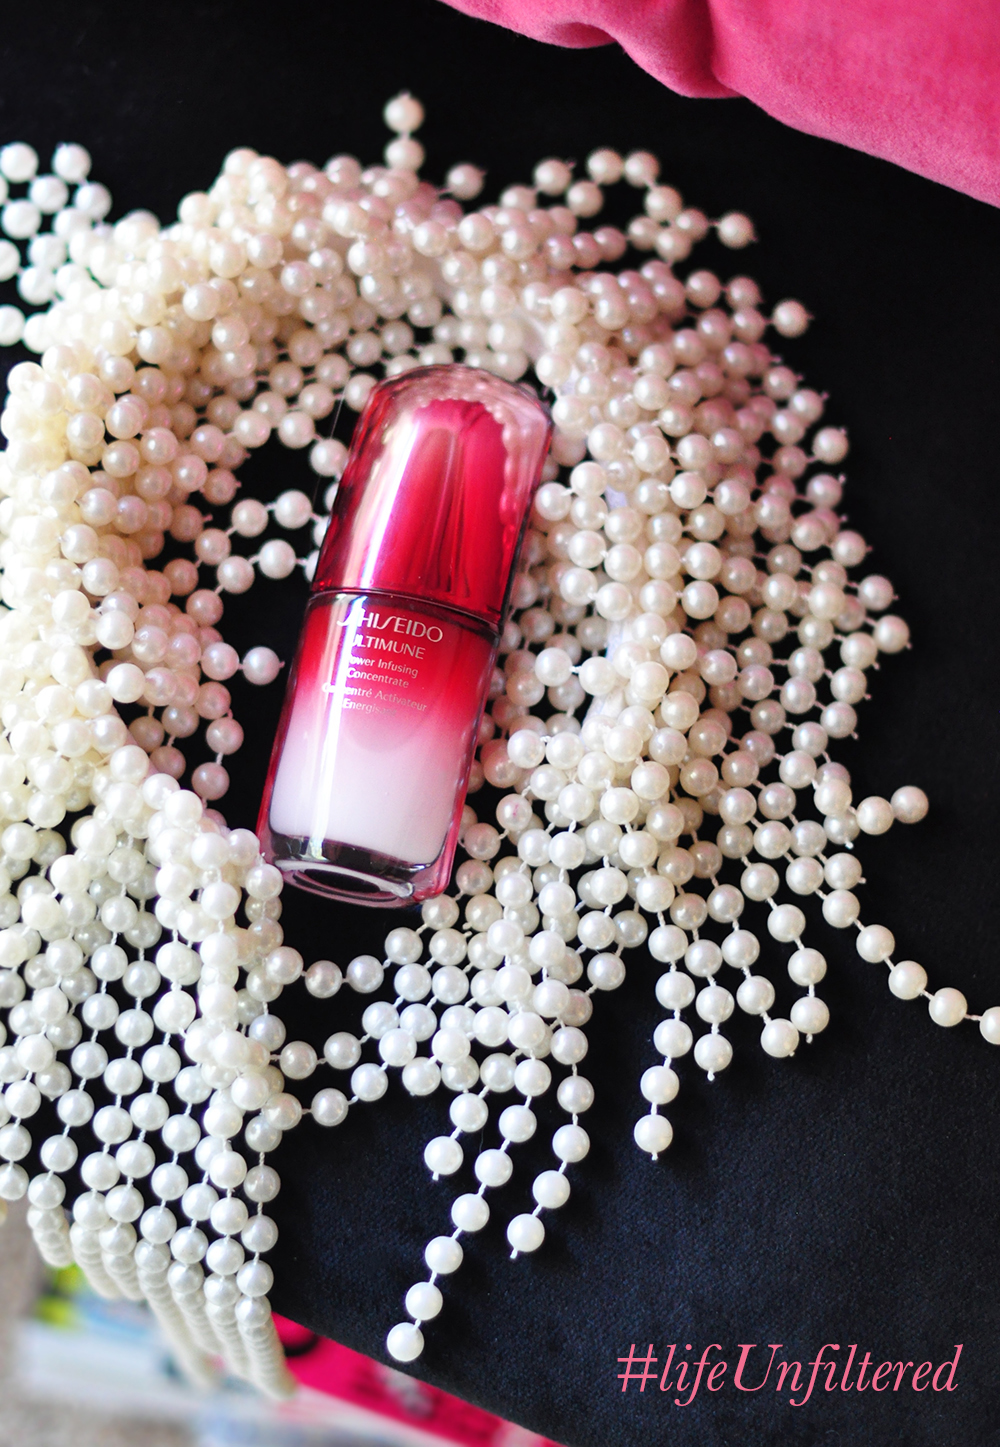 Shiseido_loveMaegan_8_life unfiltered tag